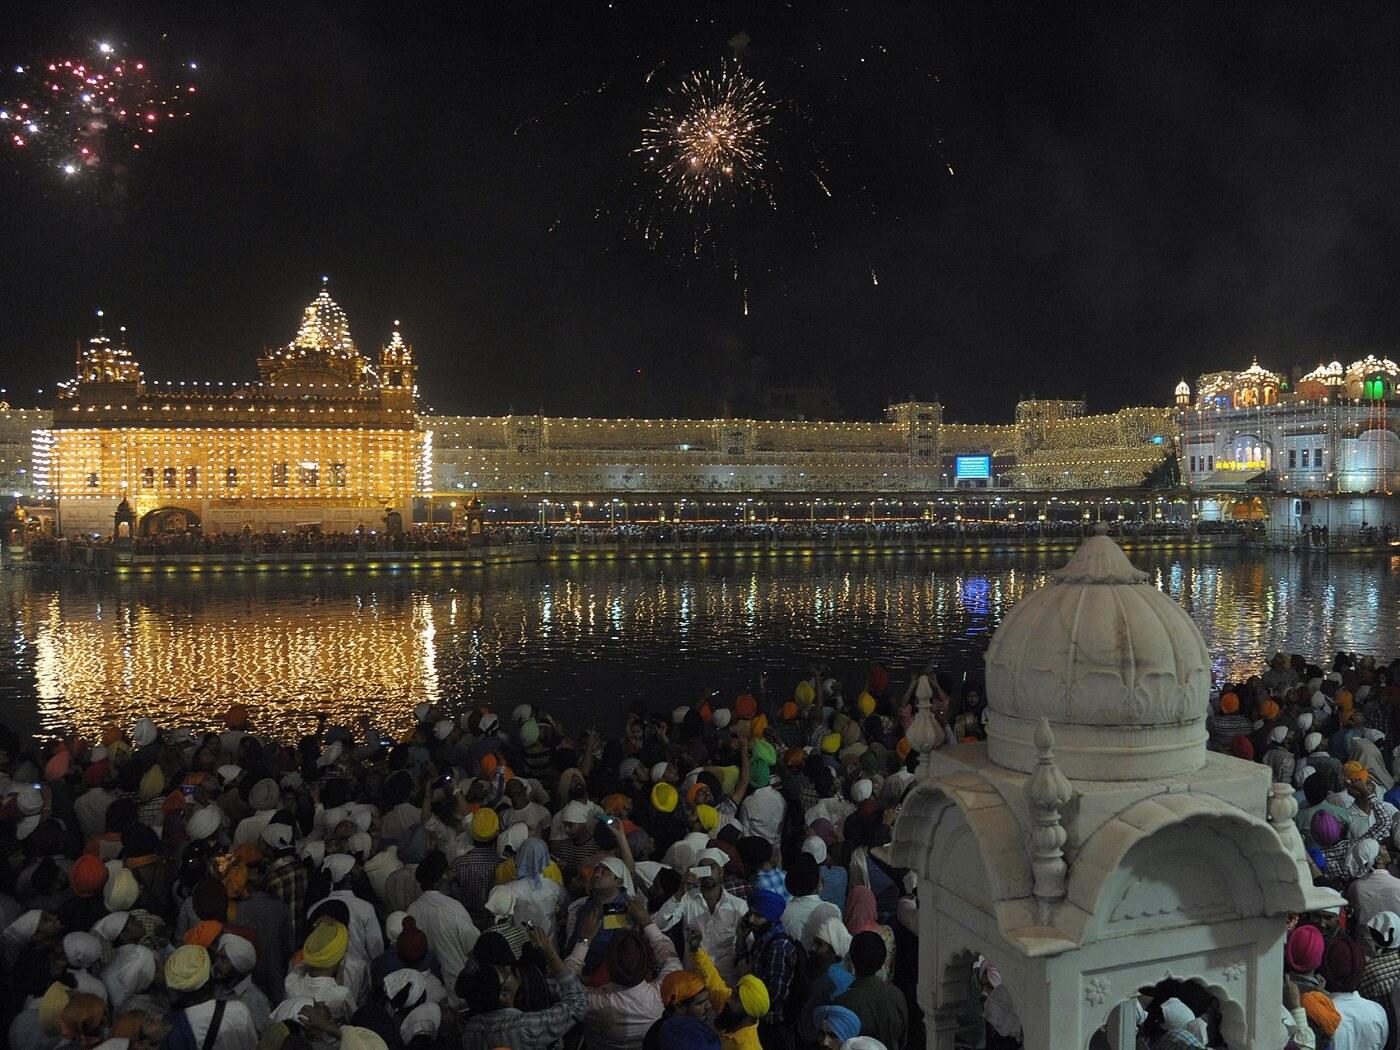 Golden Temple Amritsar during Diwali